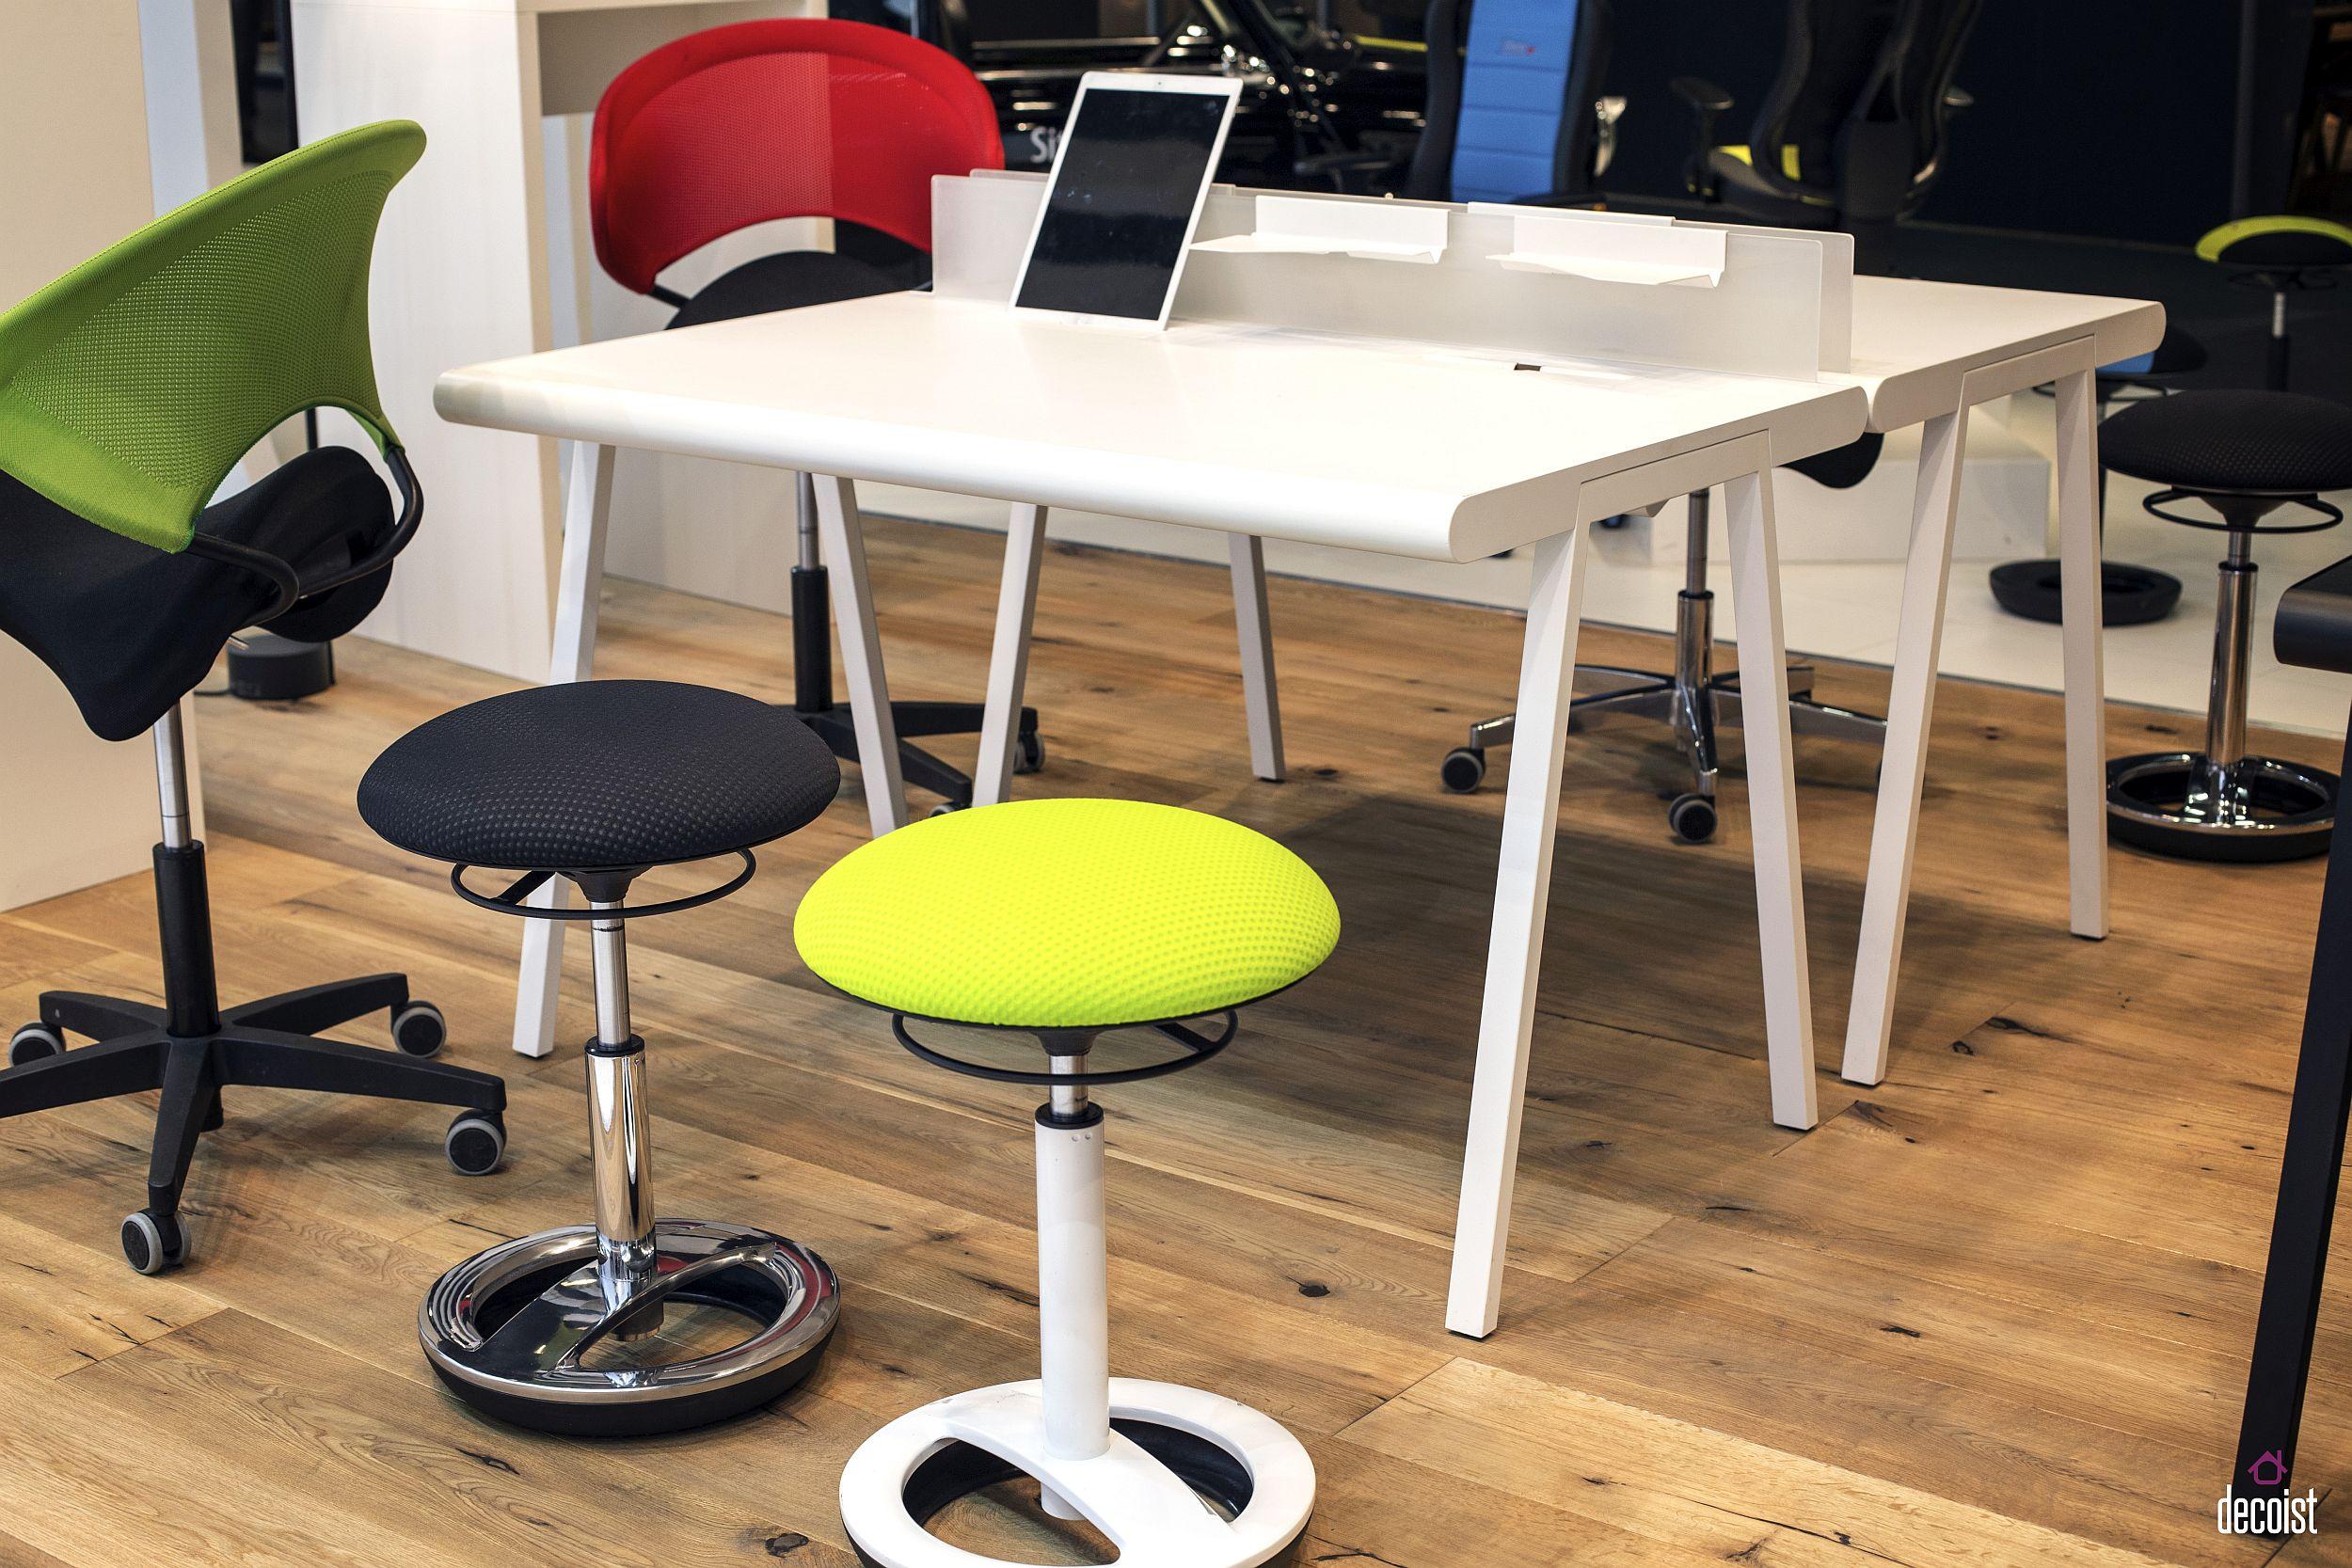 Innovative desk design from Sitness